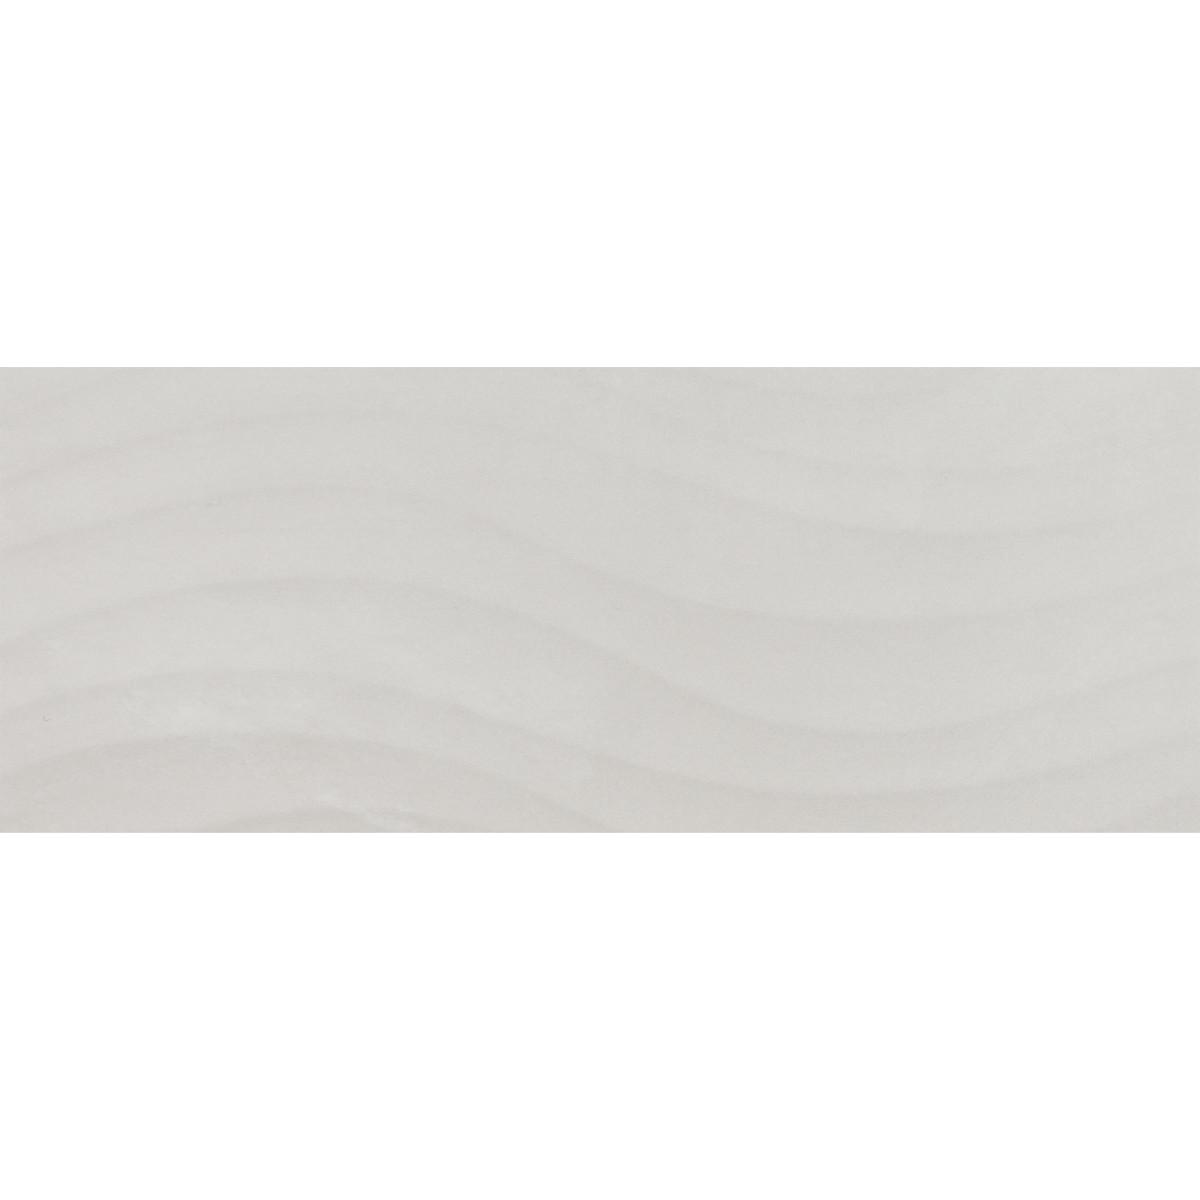 Плитка настенная Osaka Wave 20x50 см 1.3 м² цвет серый